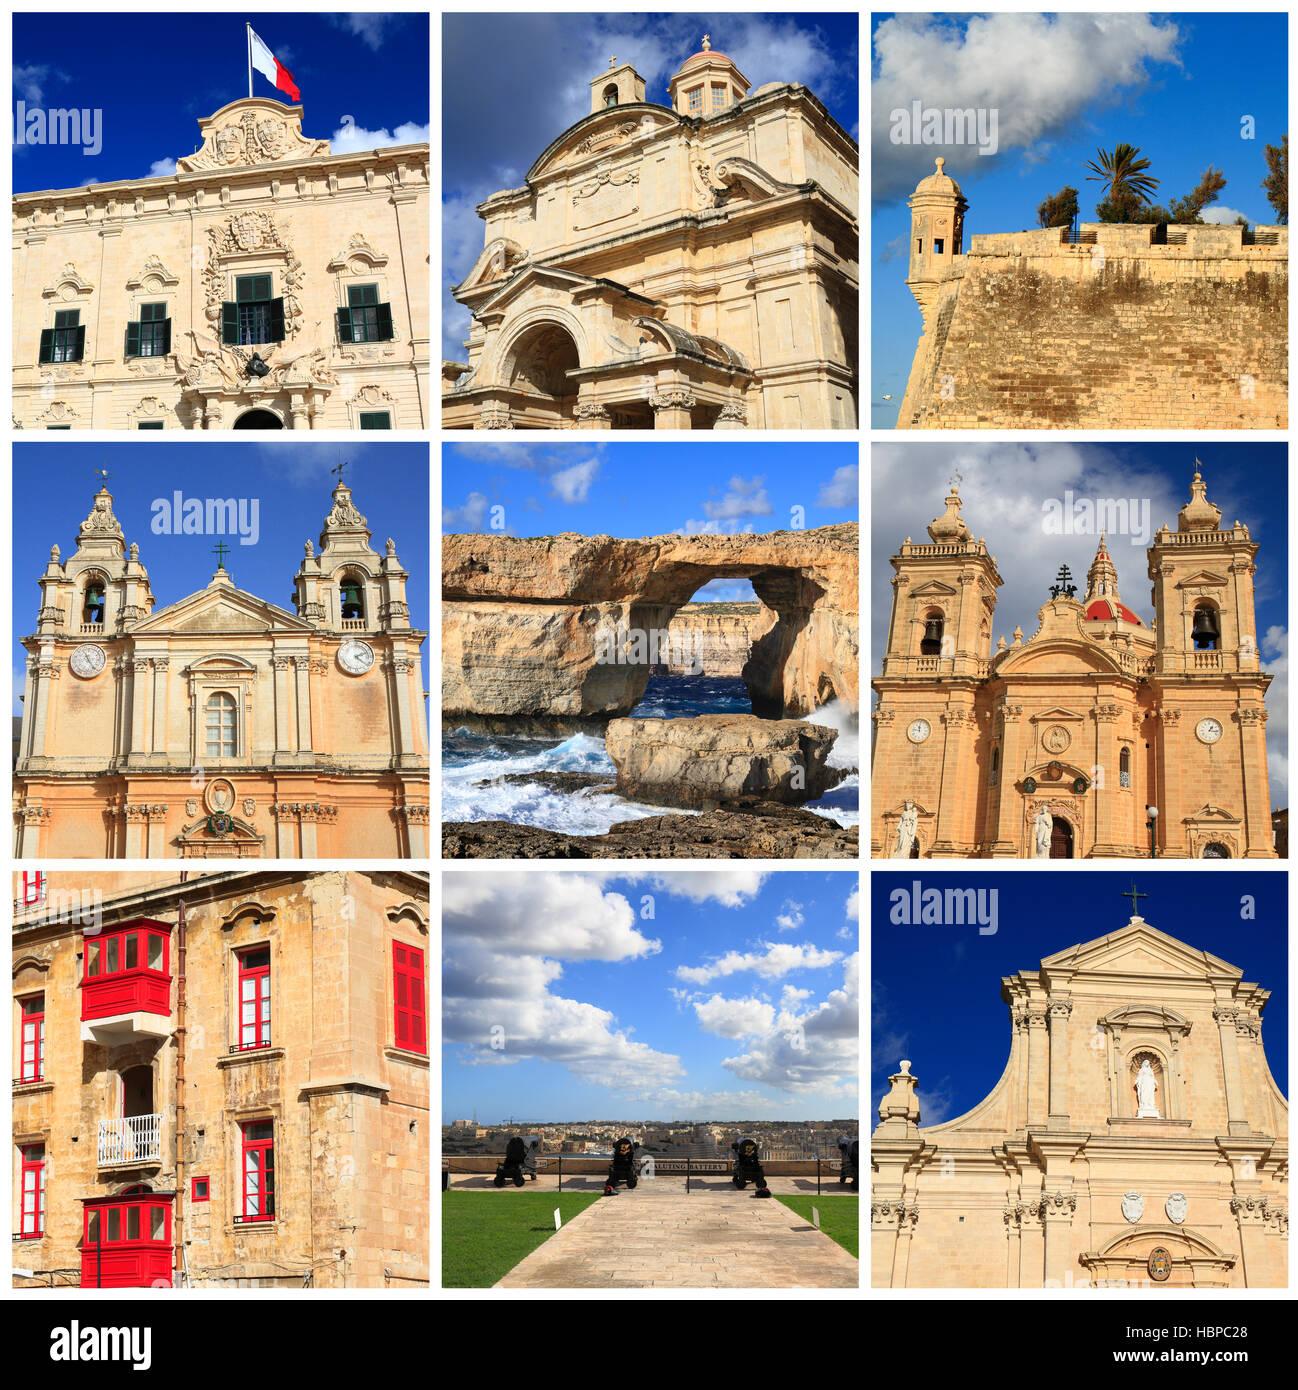 Impressions of Malta - Stock Image